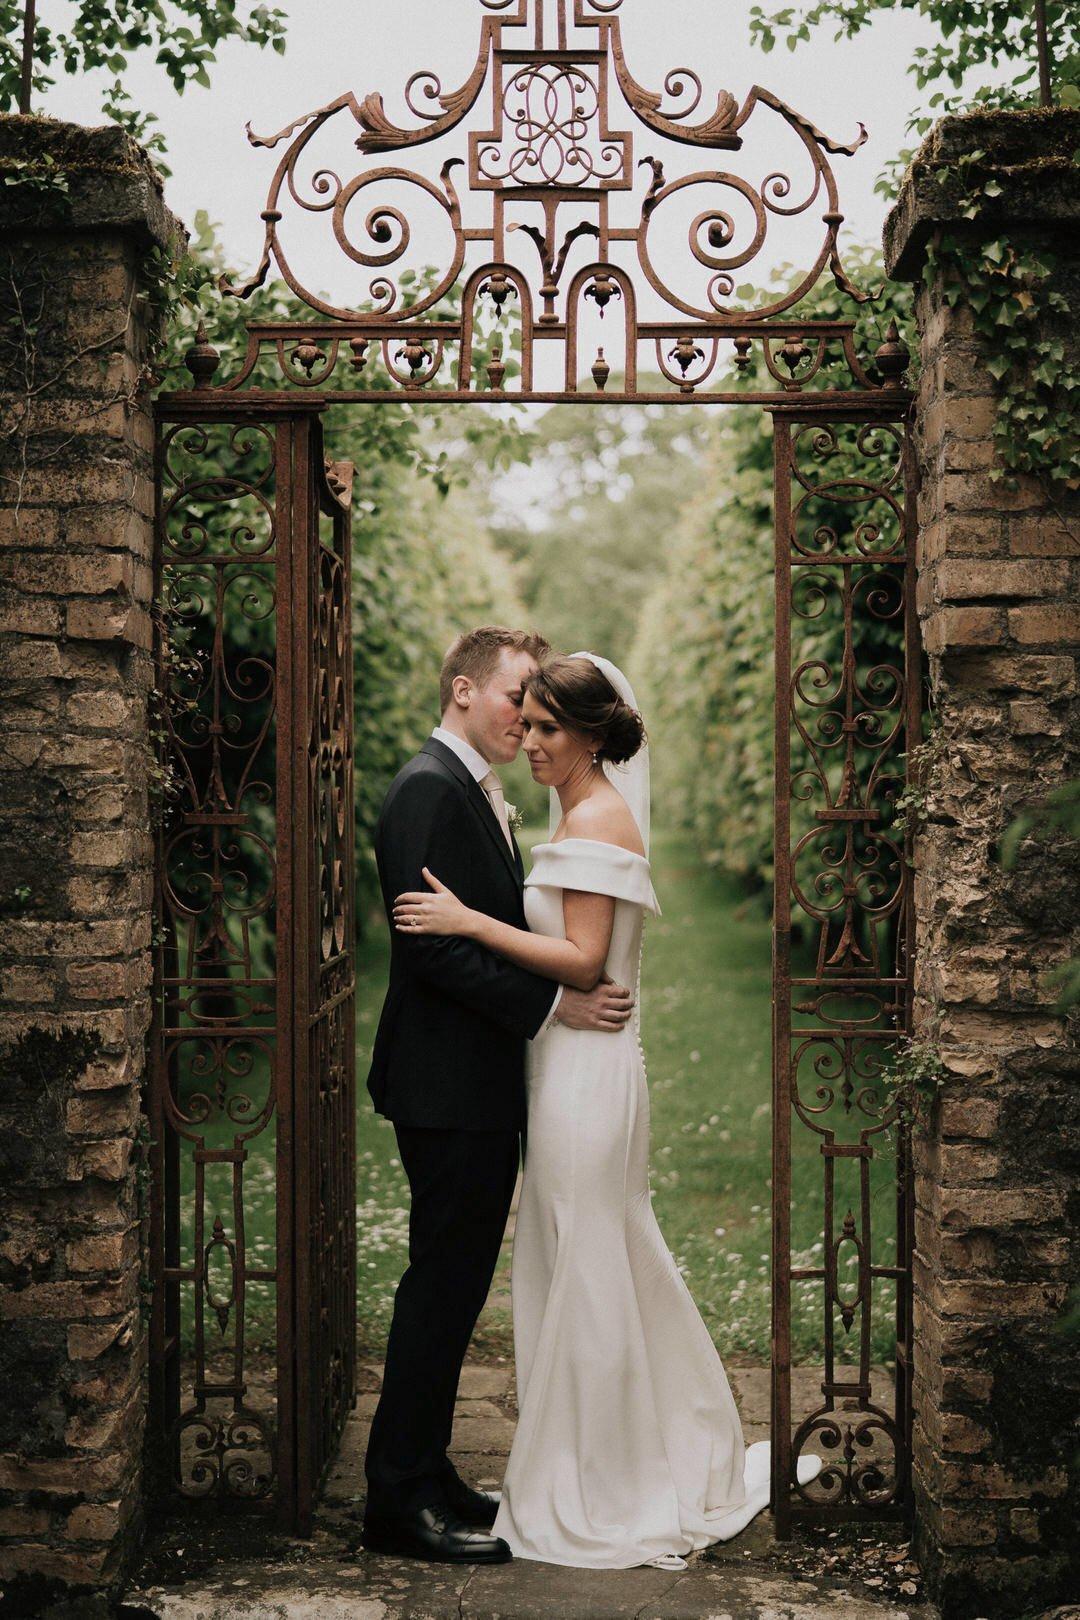 Gloster-House-wedding-photos8 8